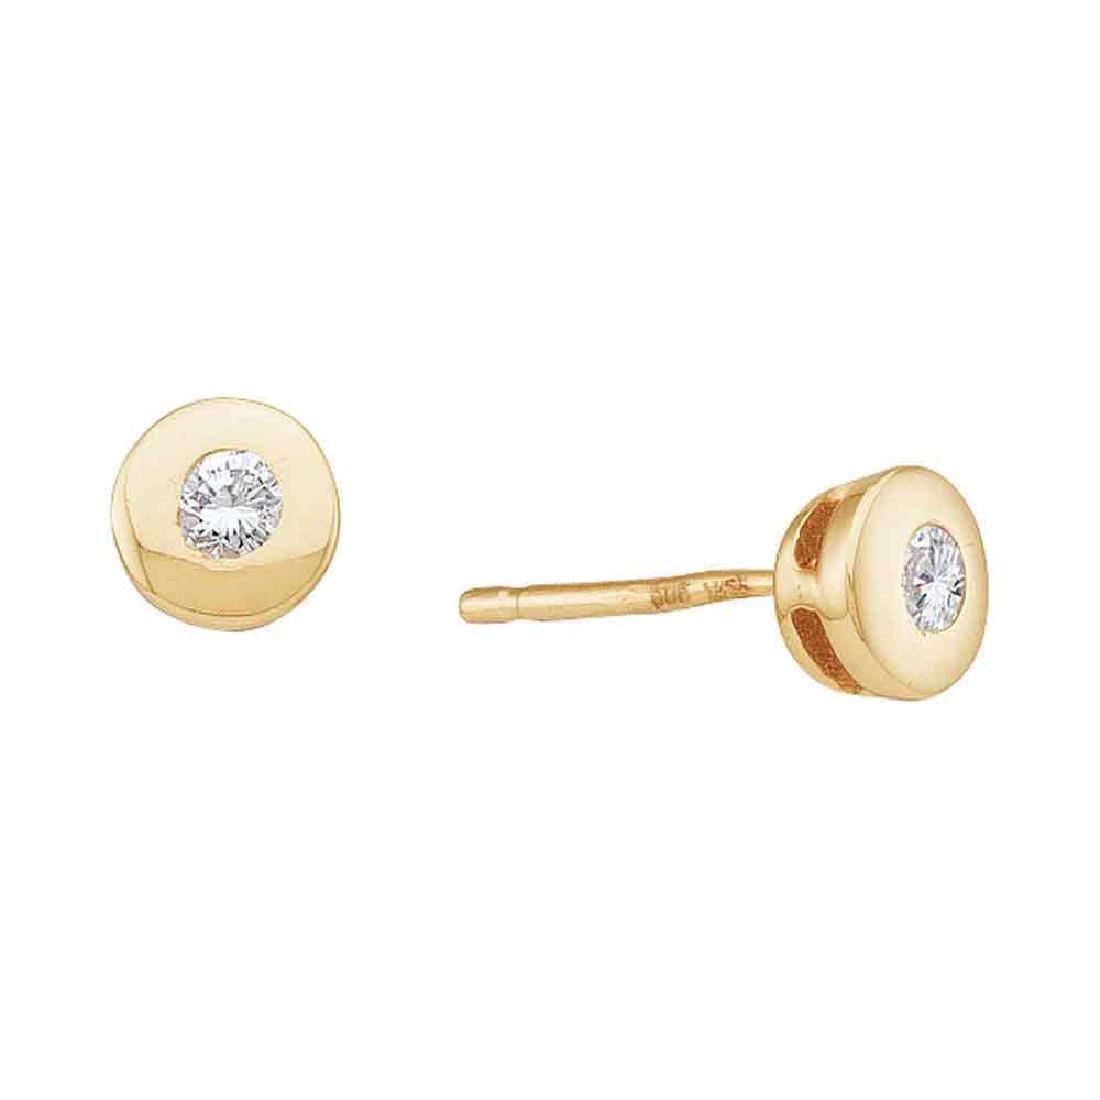 0.10 CTW Diamond Solitaire Screwback Stud Earrings 14KT